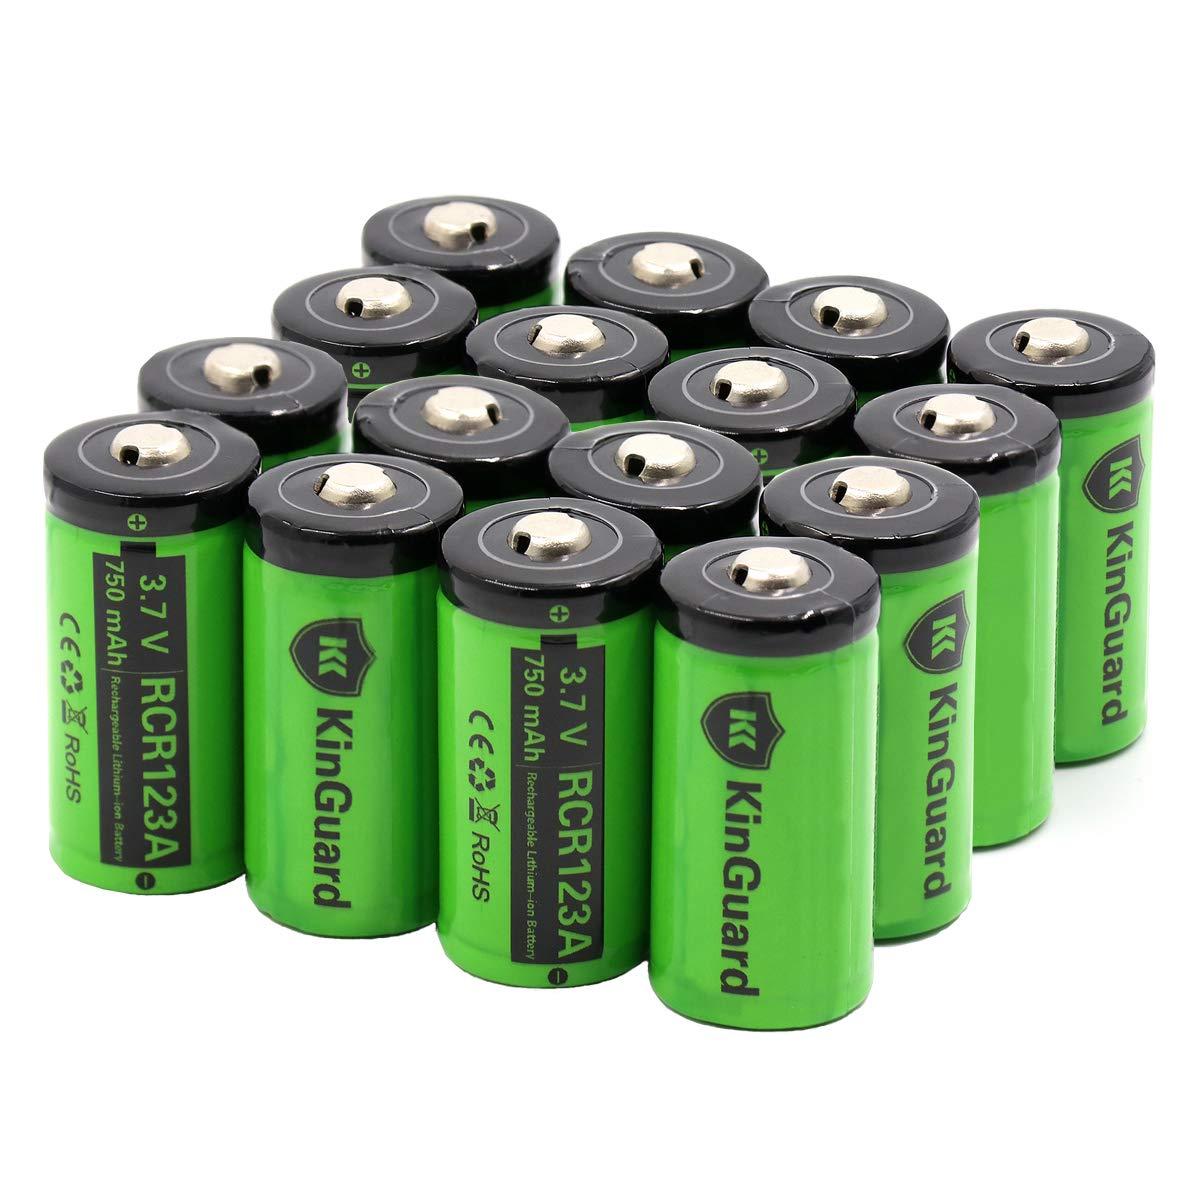 RCR123A Rechargeable Batteries KinGuard 8 Pack 3.7V 750mAh CR123A Li-ion Battery for Arlo Camera VMC3030 VMK3200 VMS3330 3430 3530 Security System Flashlight by KinGuard